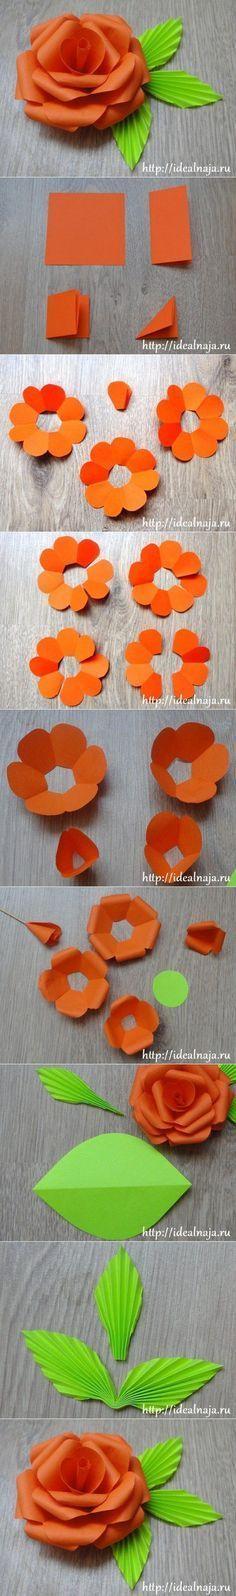 51 Best Paper Flowers Tutorials Images Paper Flowers Paper